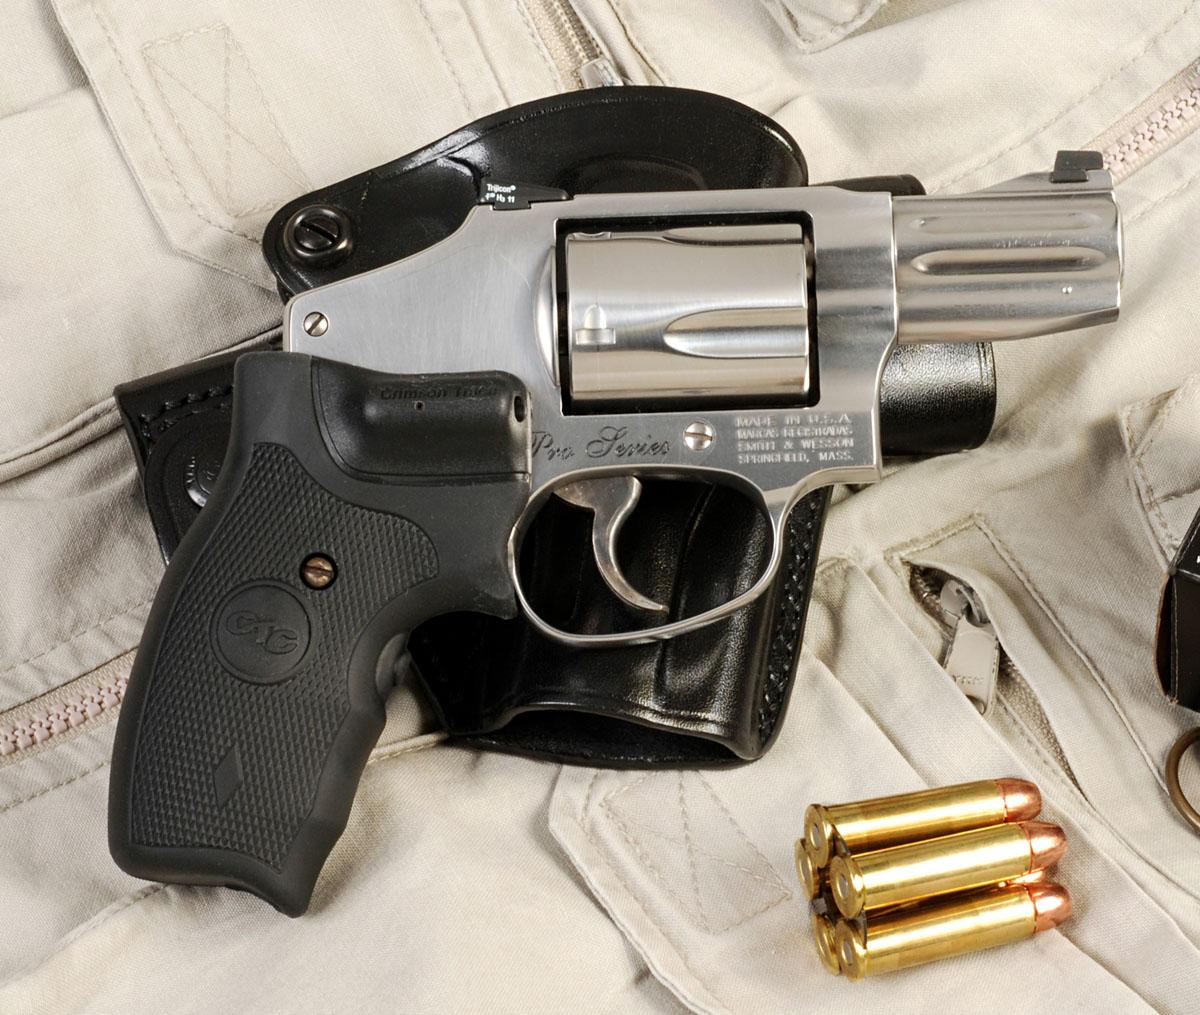 S&W Model 640 Pro Series - Review - GunsAmerica Digest